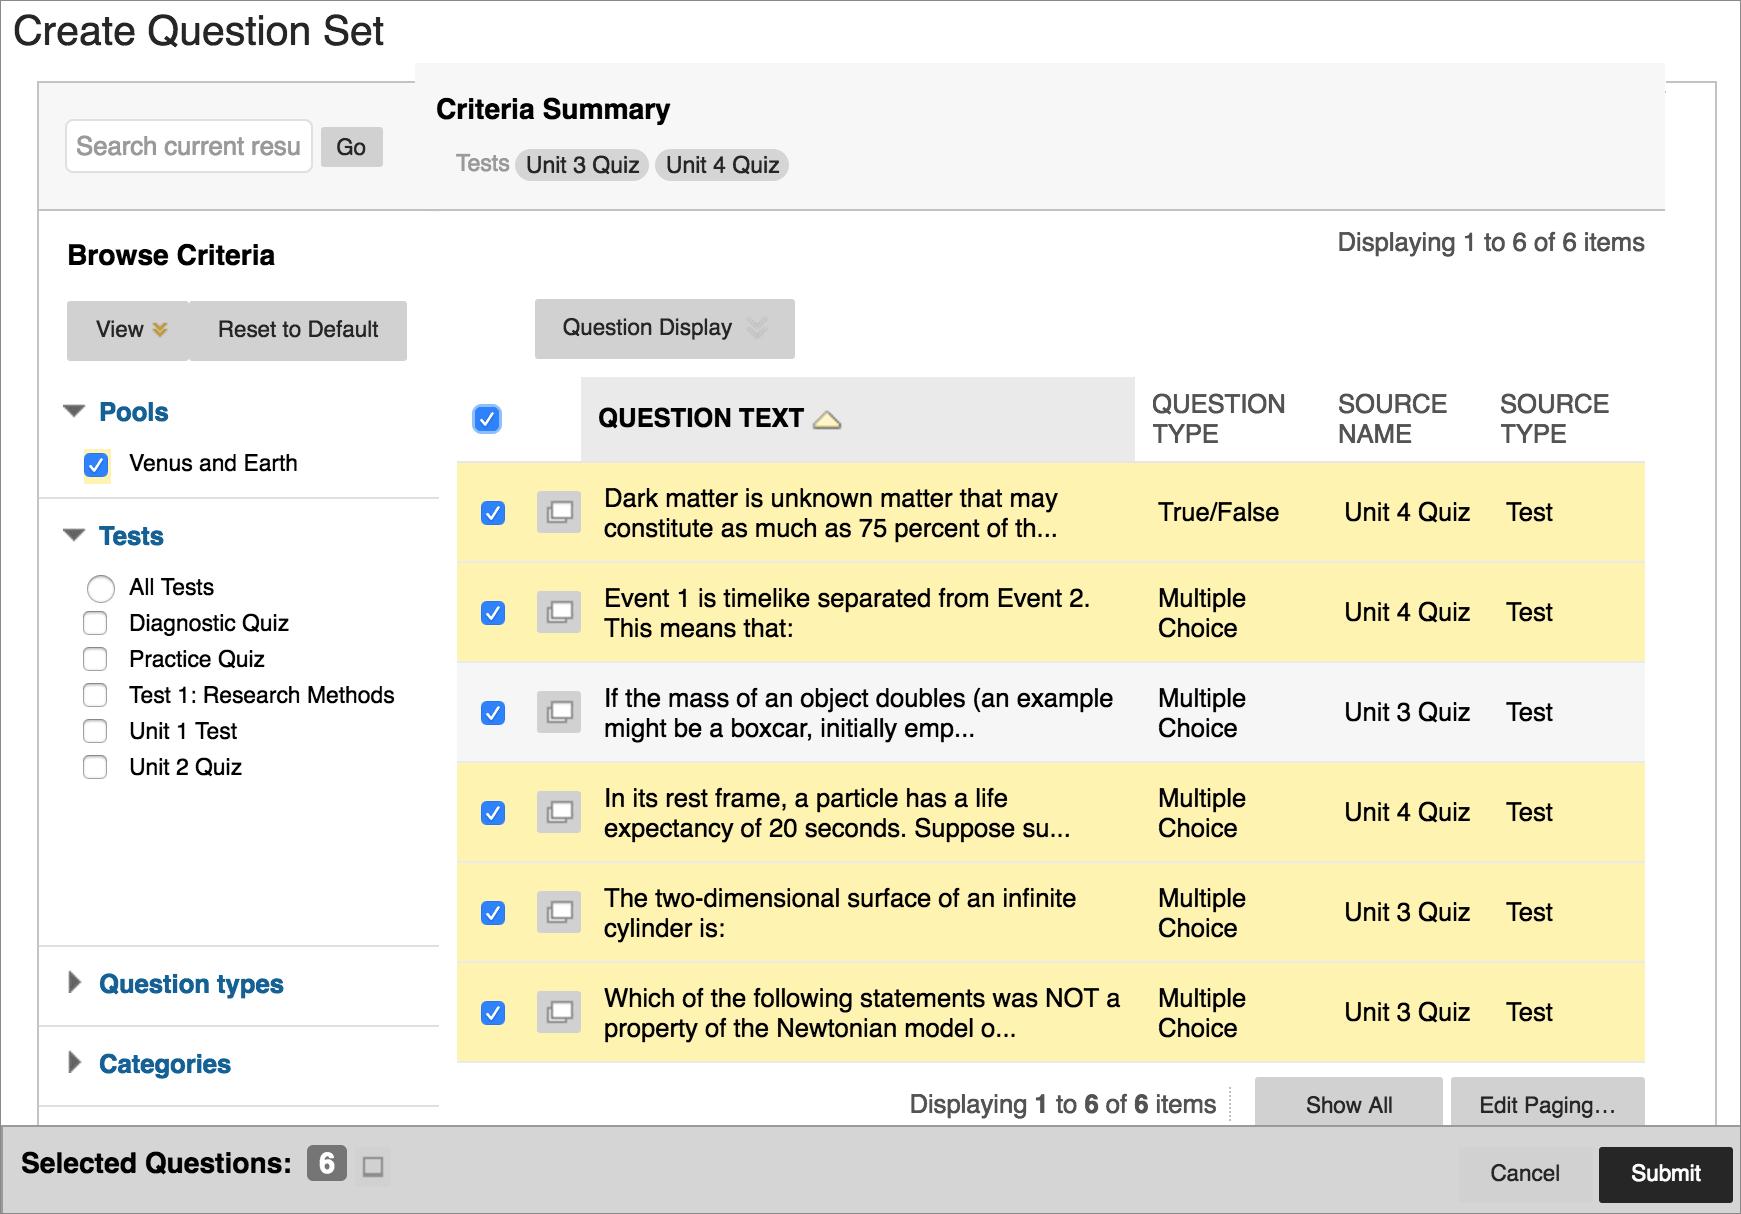 Screenshot of Create Question Set dialog box